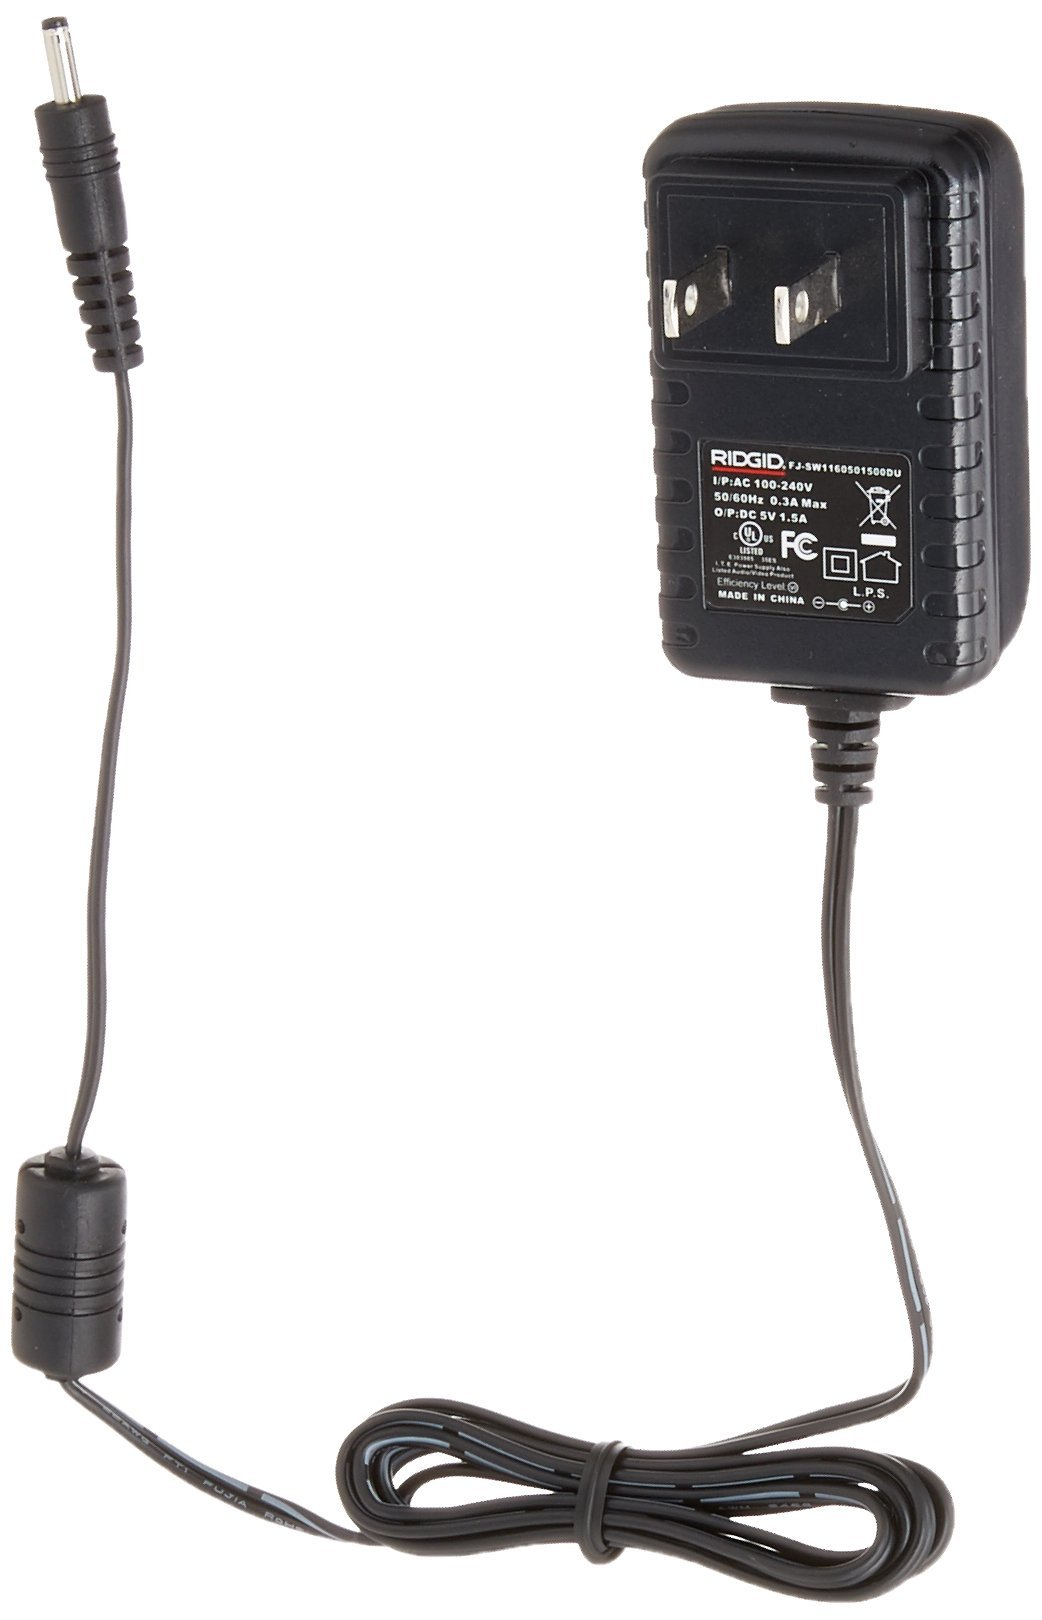 Ridgid 40028 Adapter, Ca-300 Power